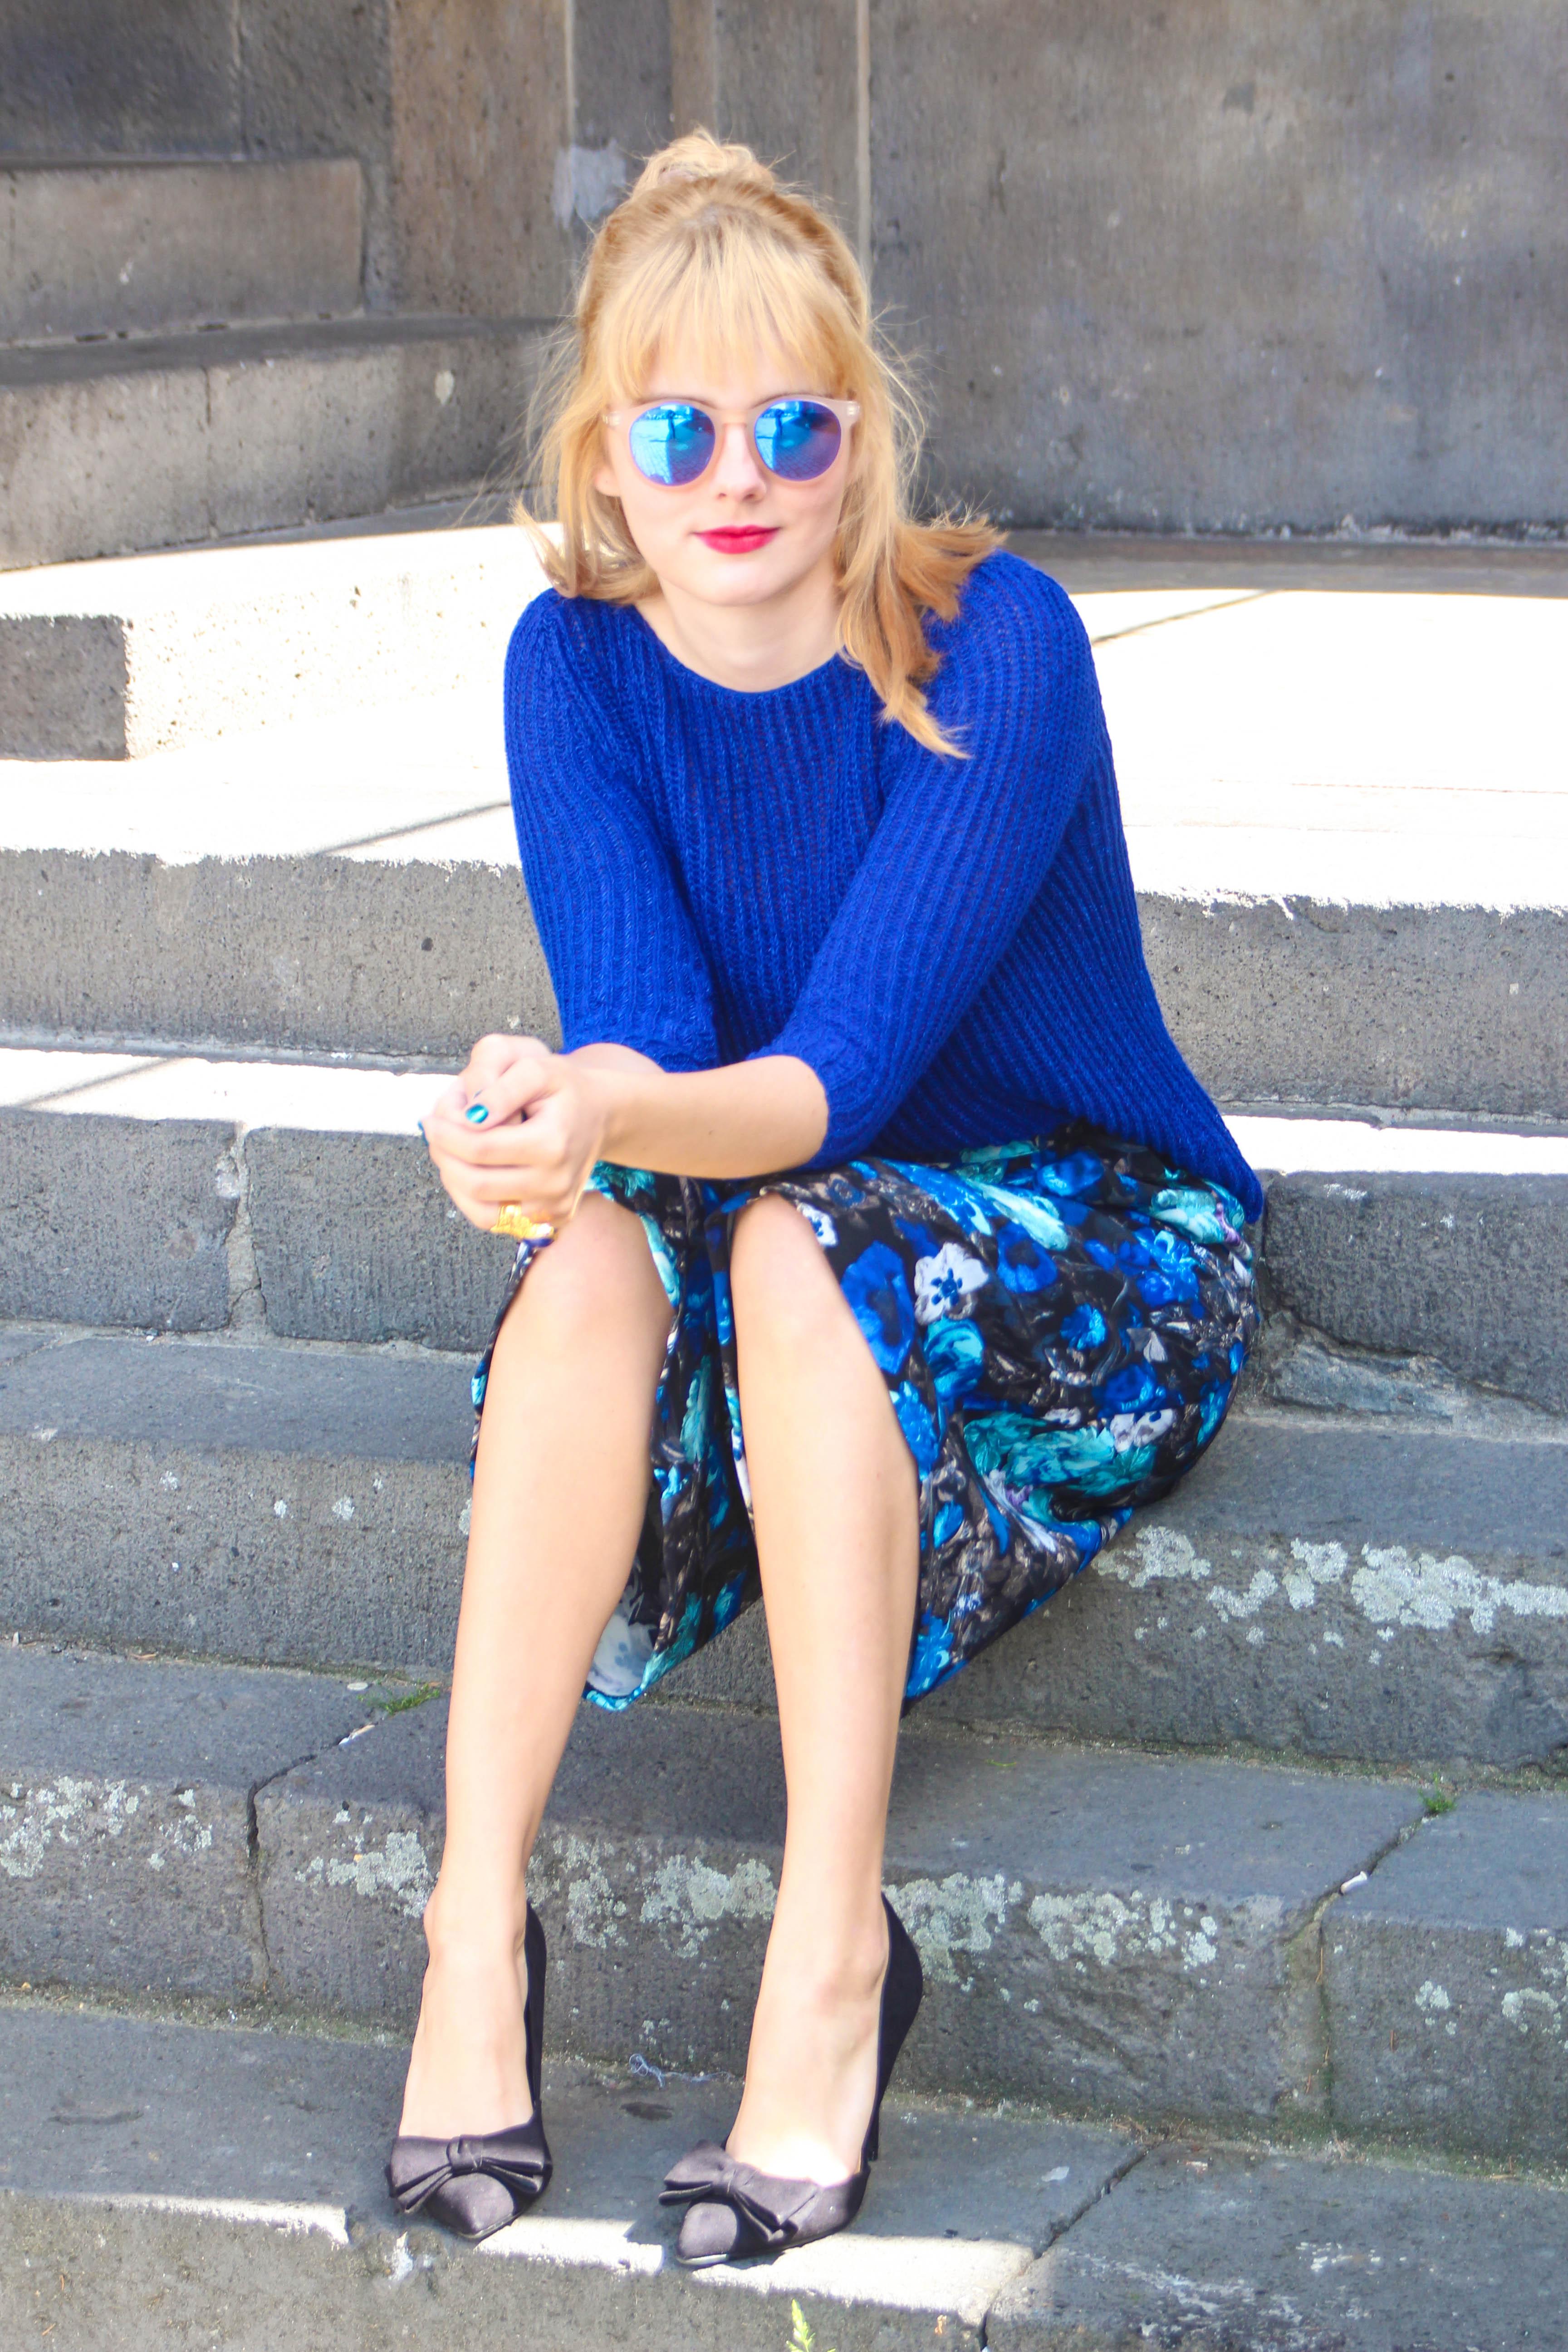 Des Belles Choses_Culotte_Floral Spring Trend 5